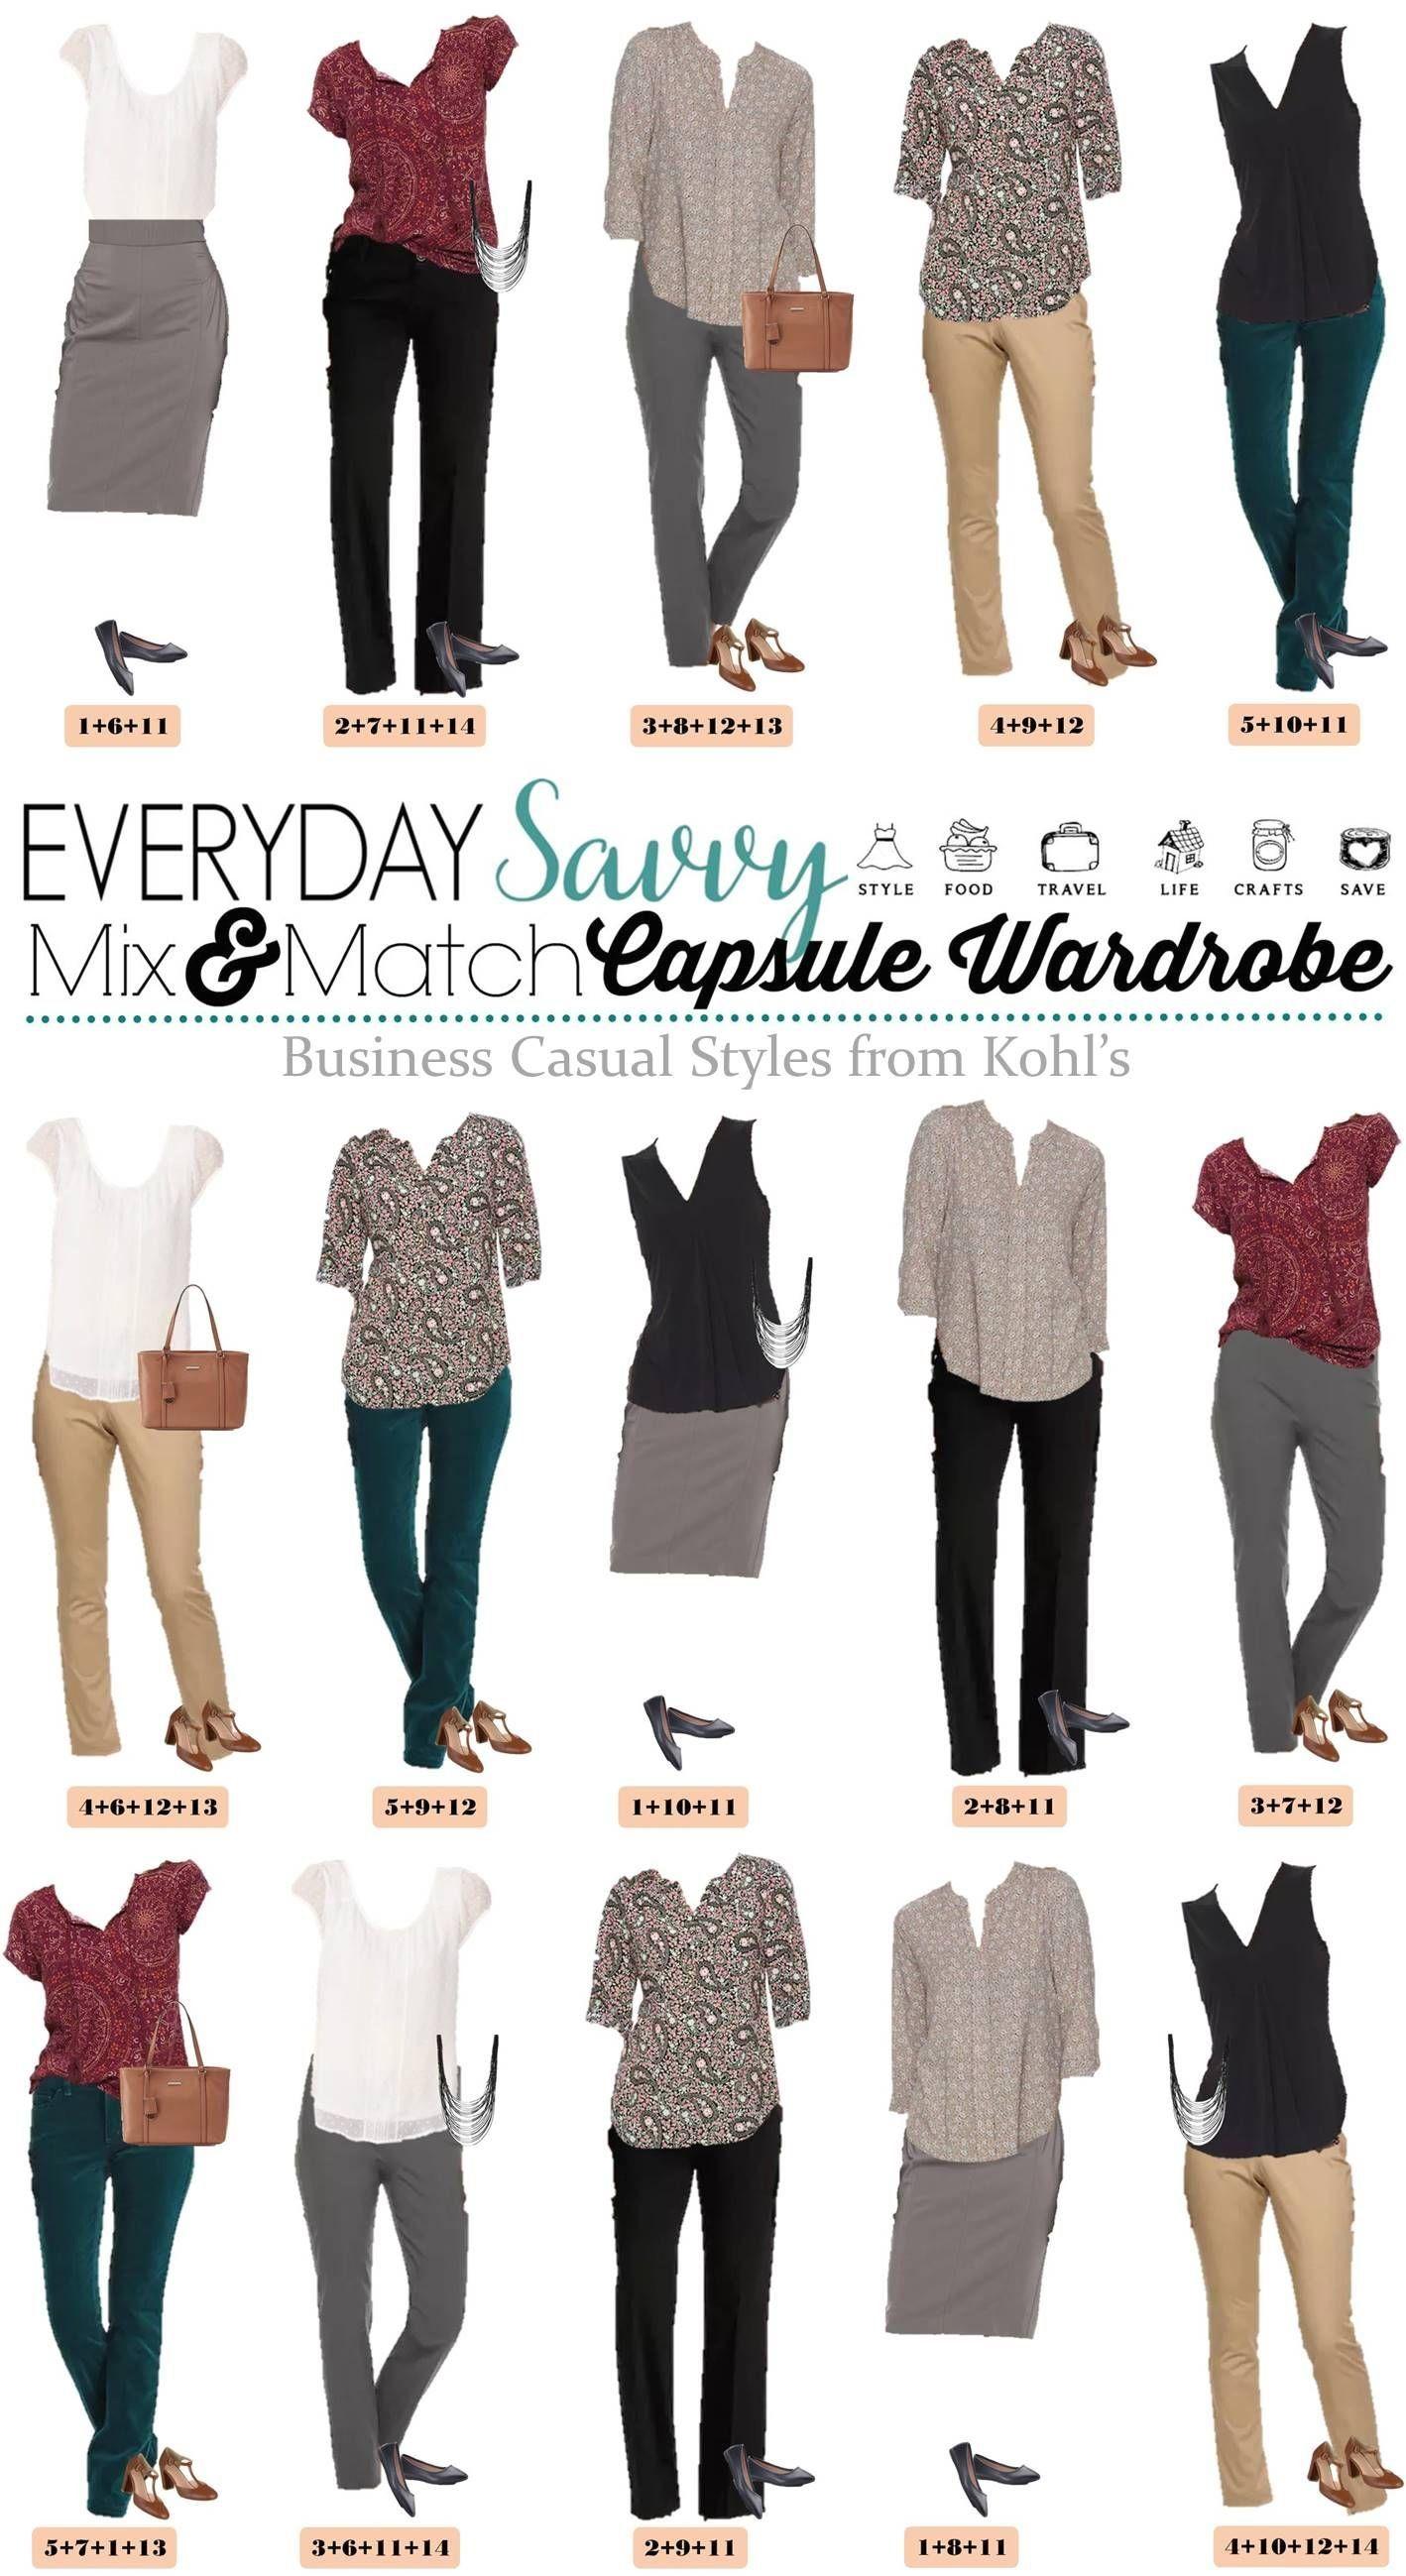 Kohls Business Casual Attire for Women - Capsule Wardrobe | 1000